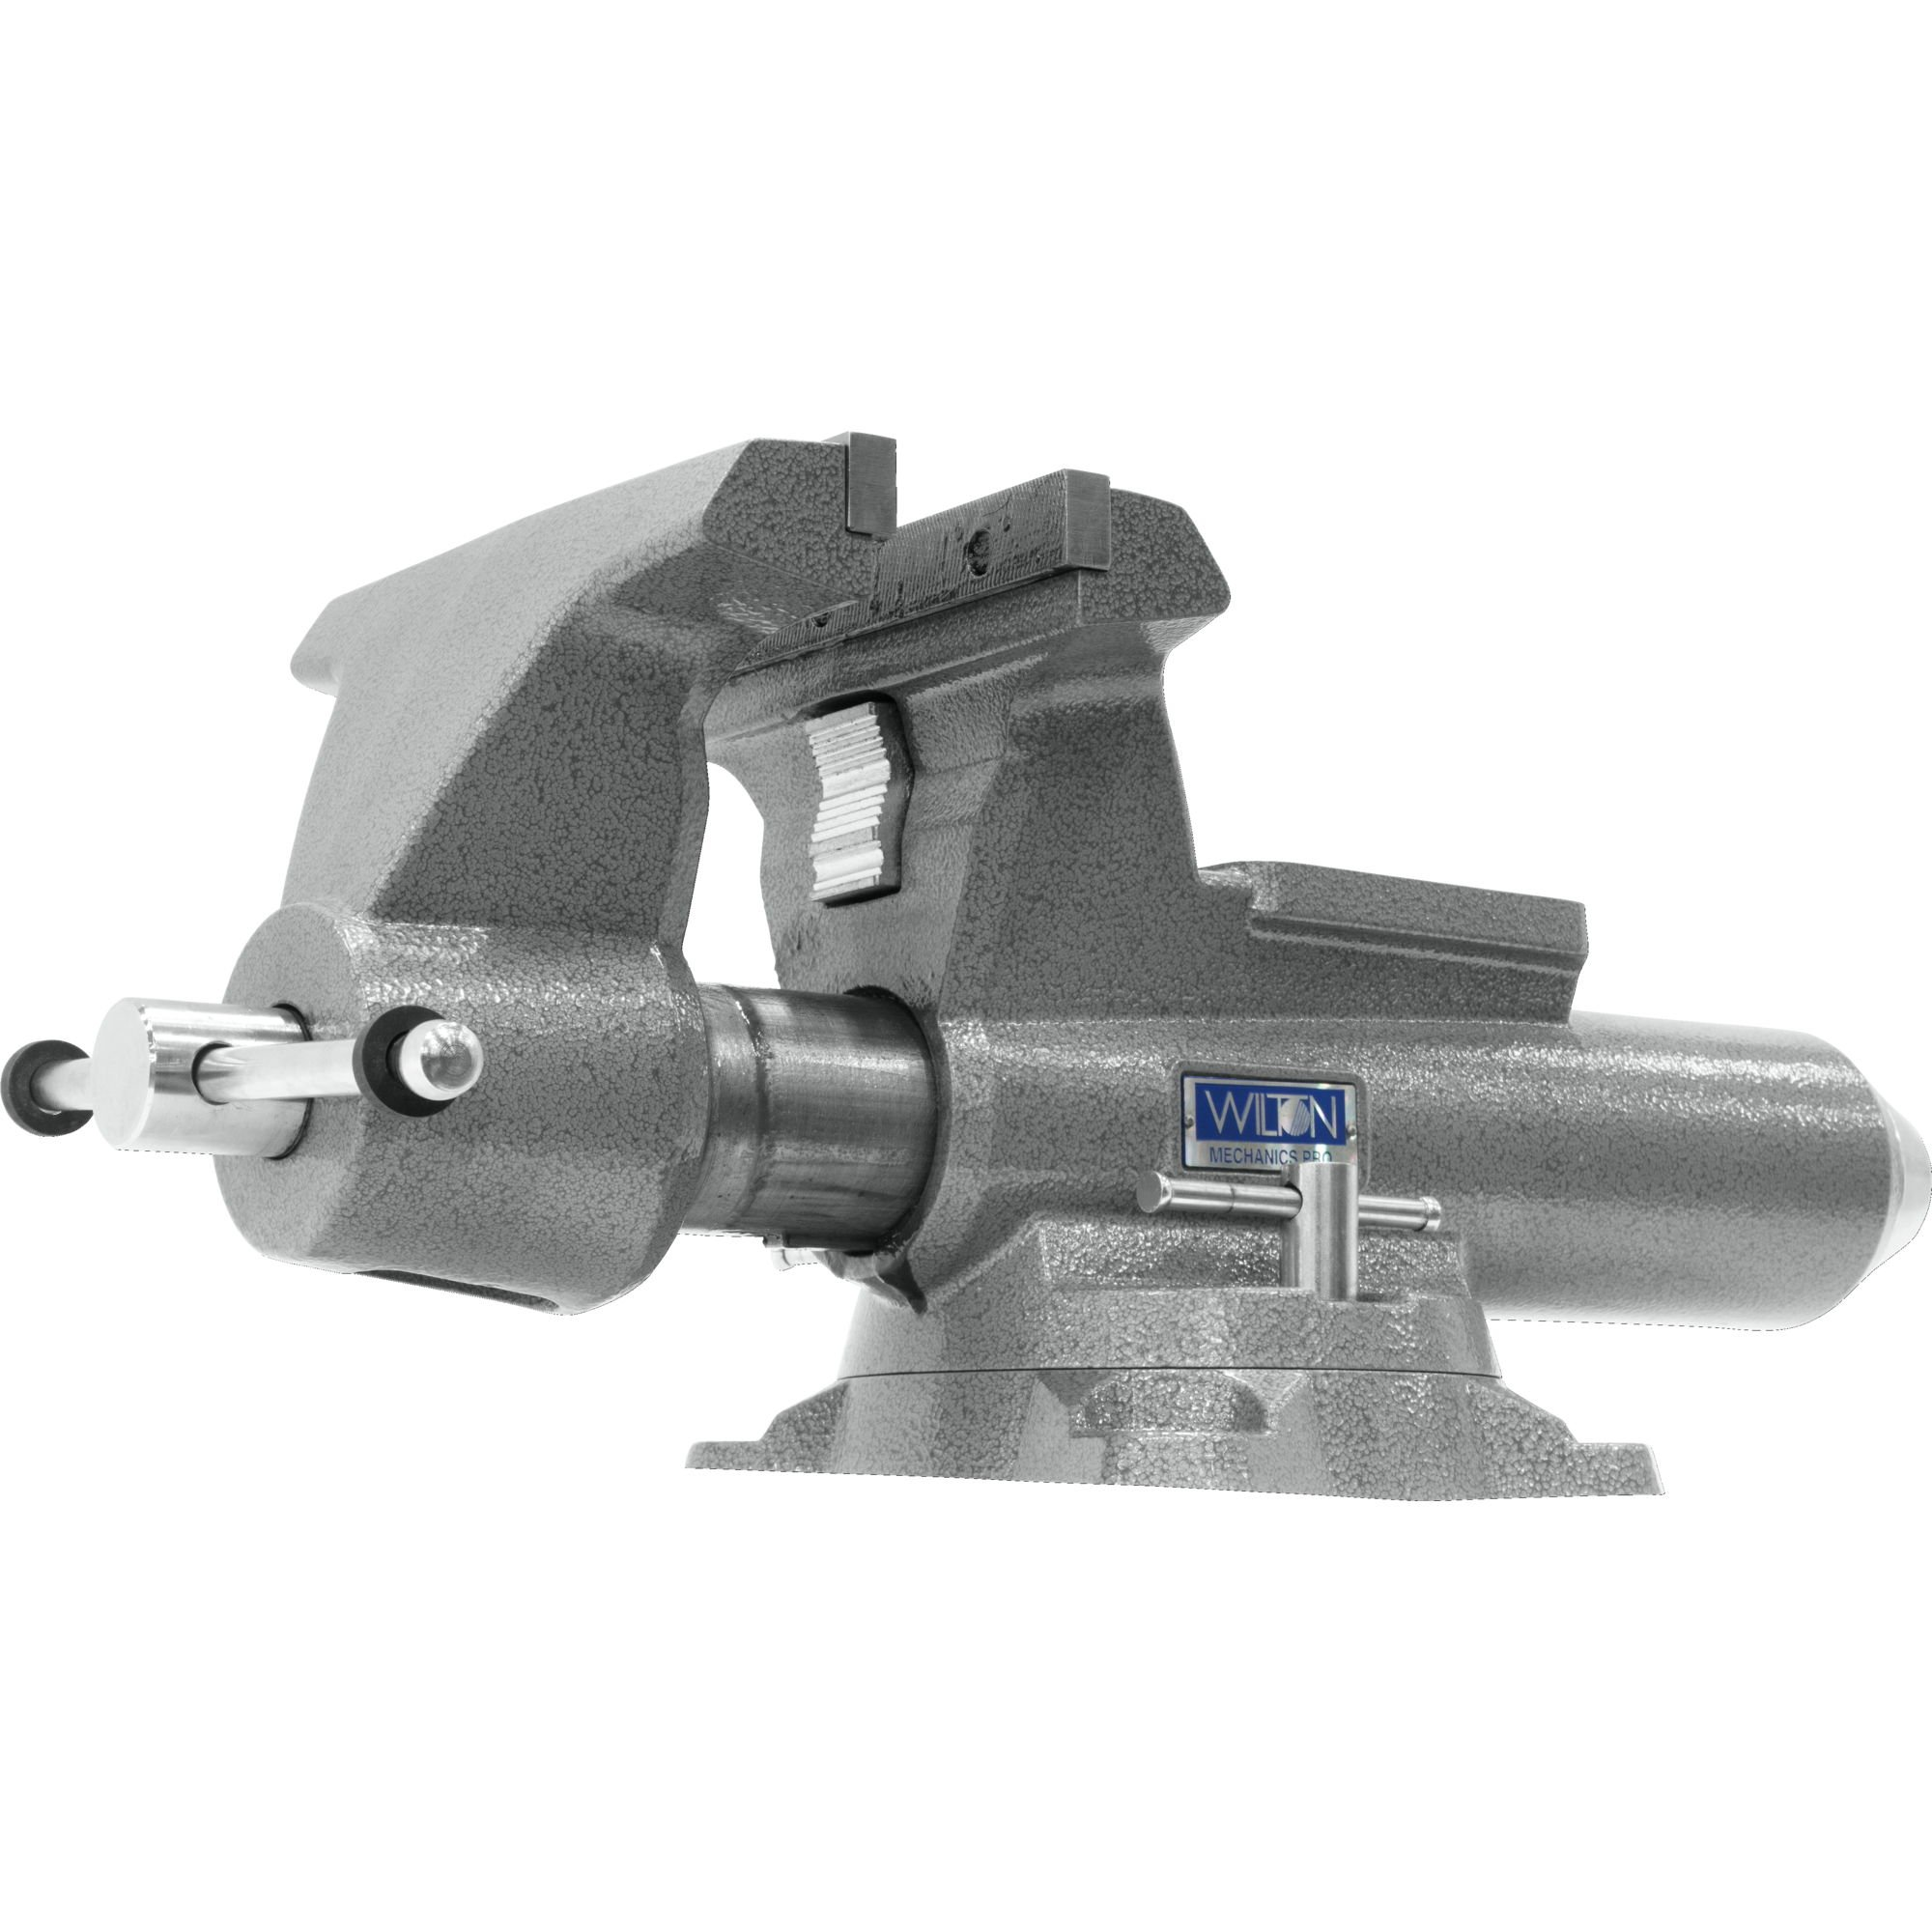 Wilton Tools 28814 8100M Wilton Mechanics Pro Vise 10''